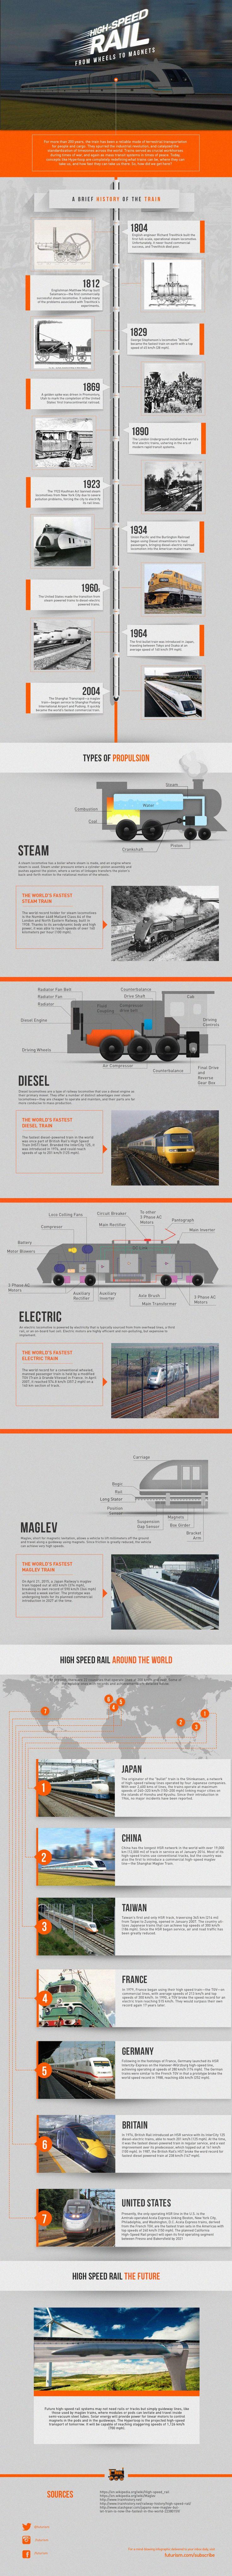 High-speed-rail infographic